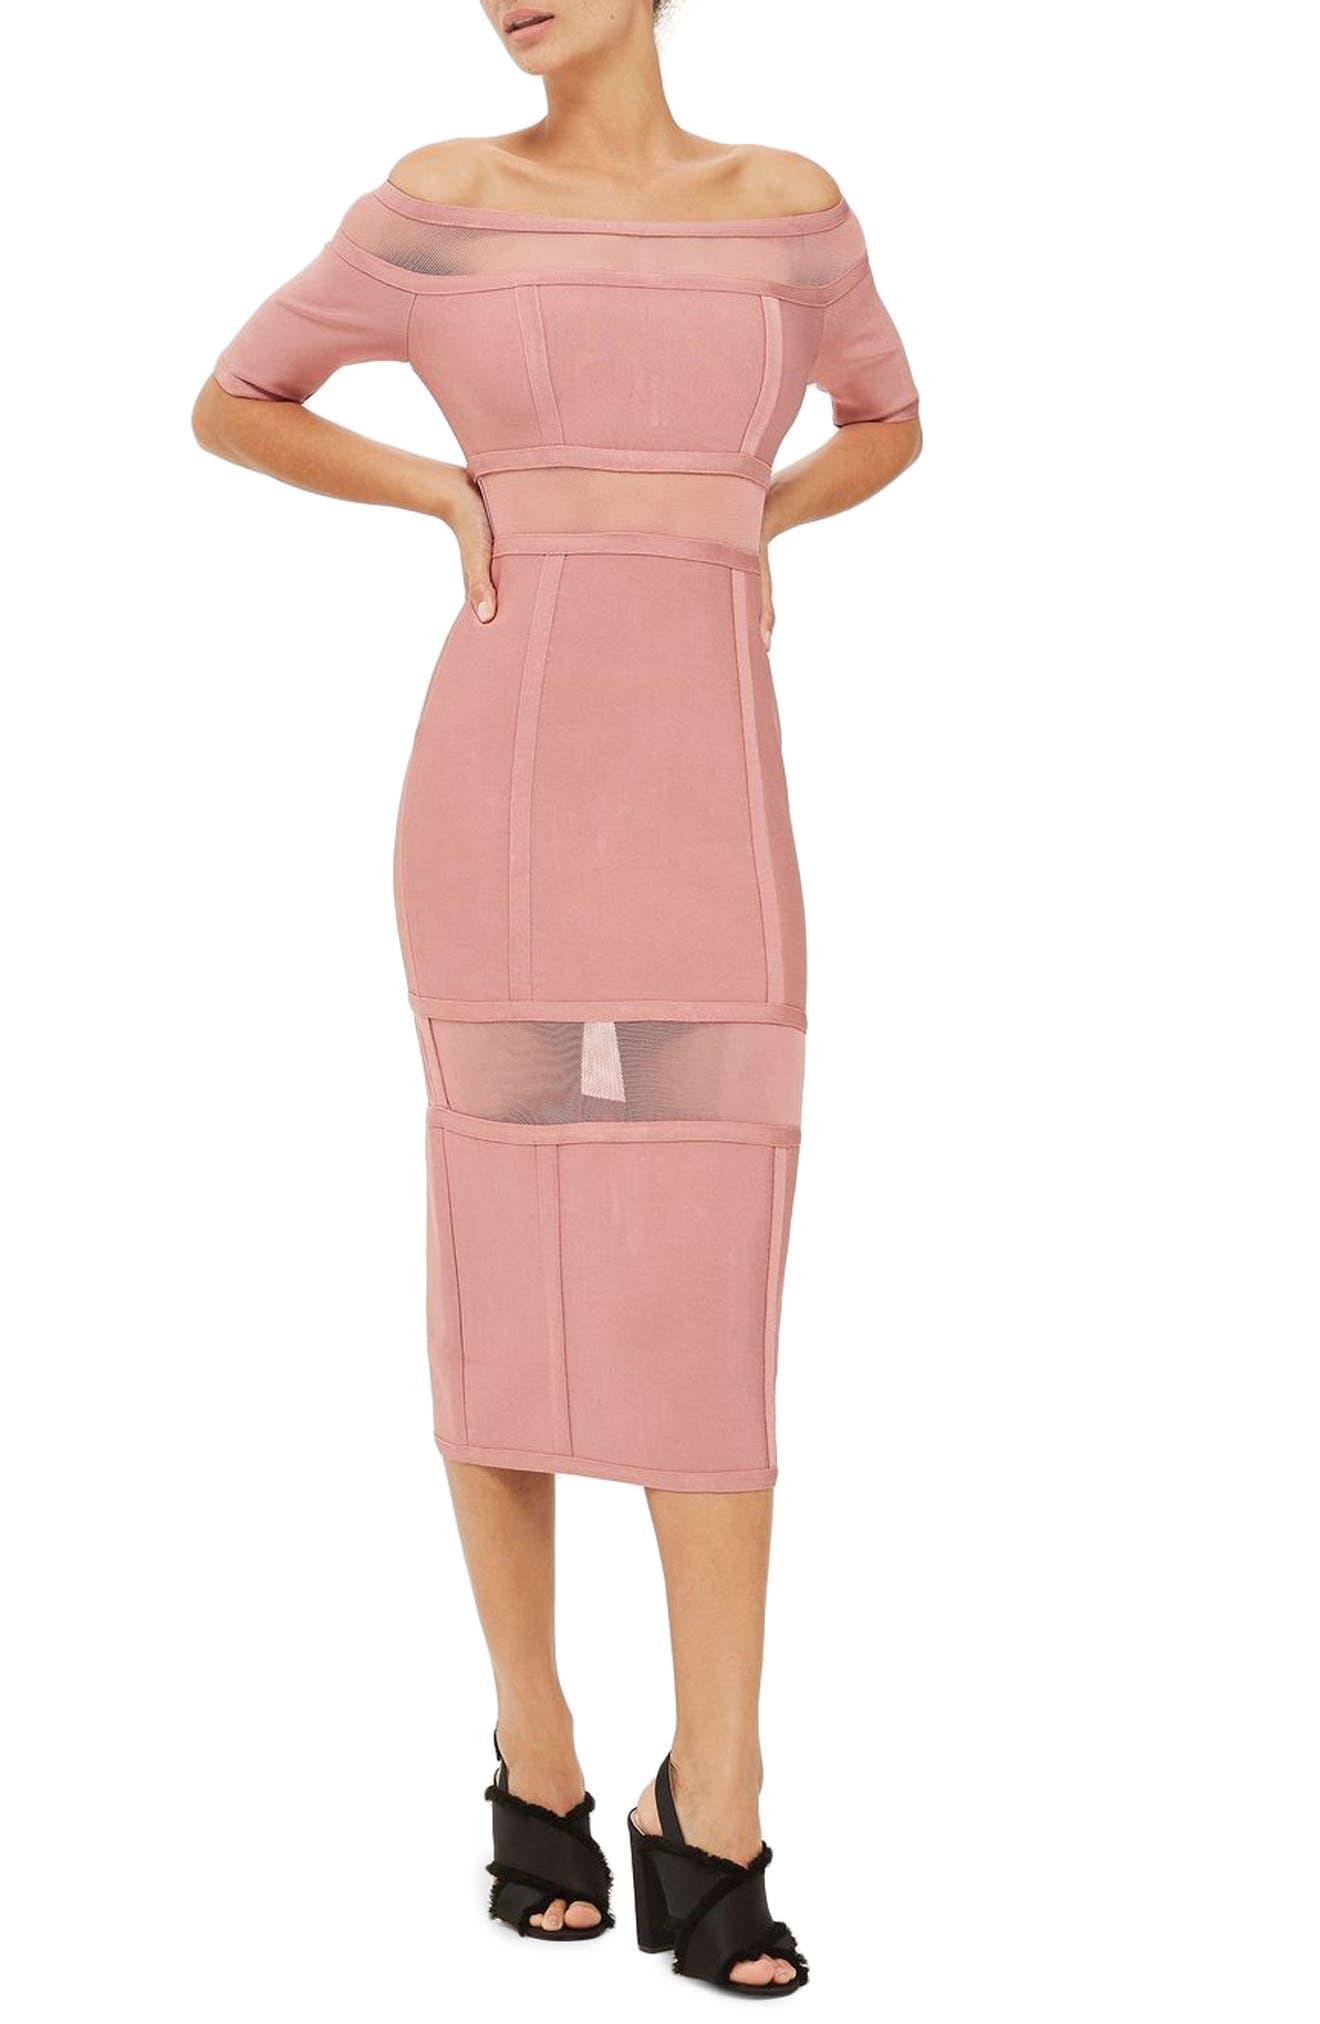 Sheer Panel Off the Shoulder Body-Con Midi Dress,                             Main thumbnail 1, color,                             Pink